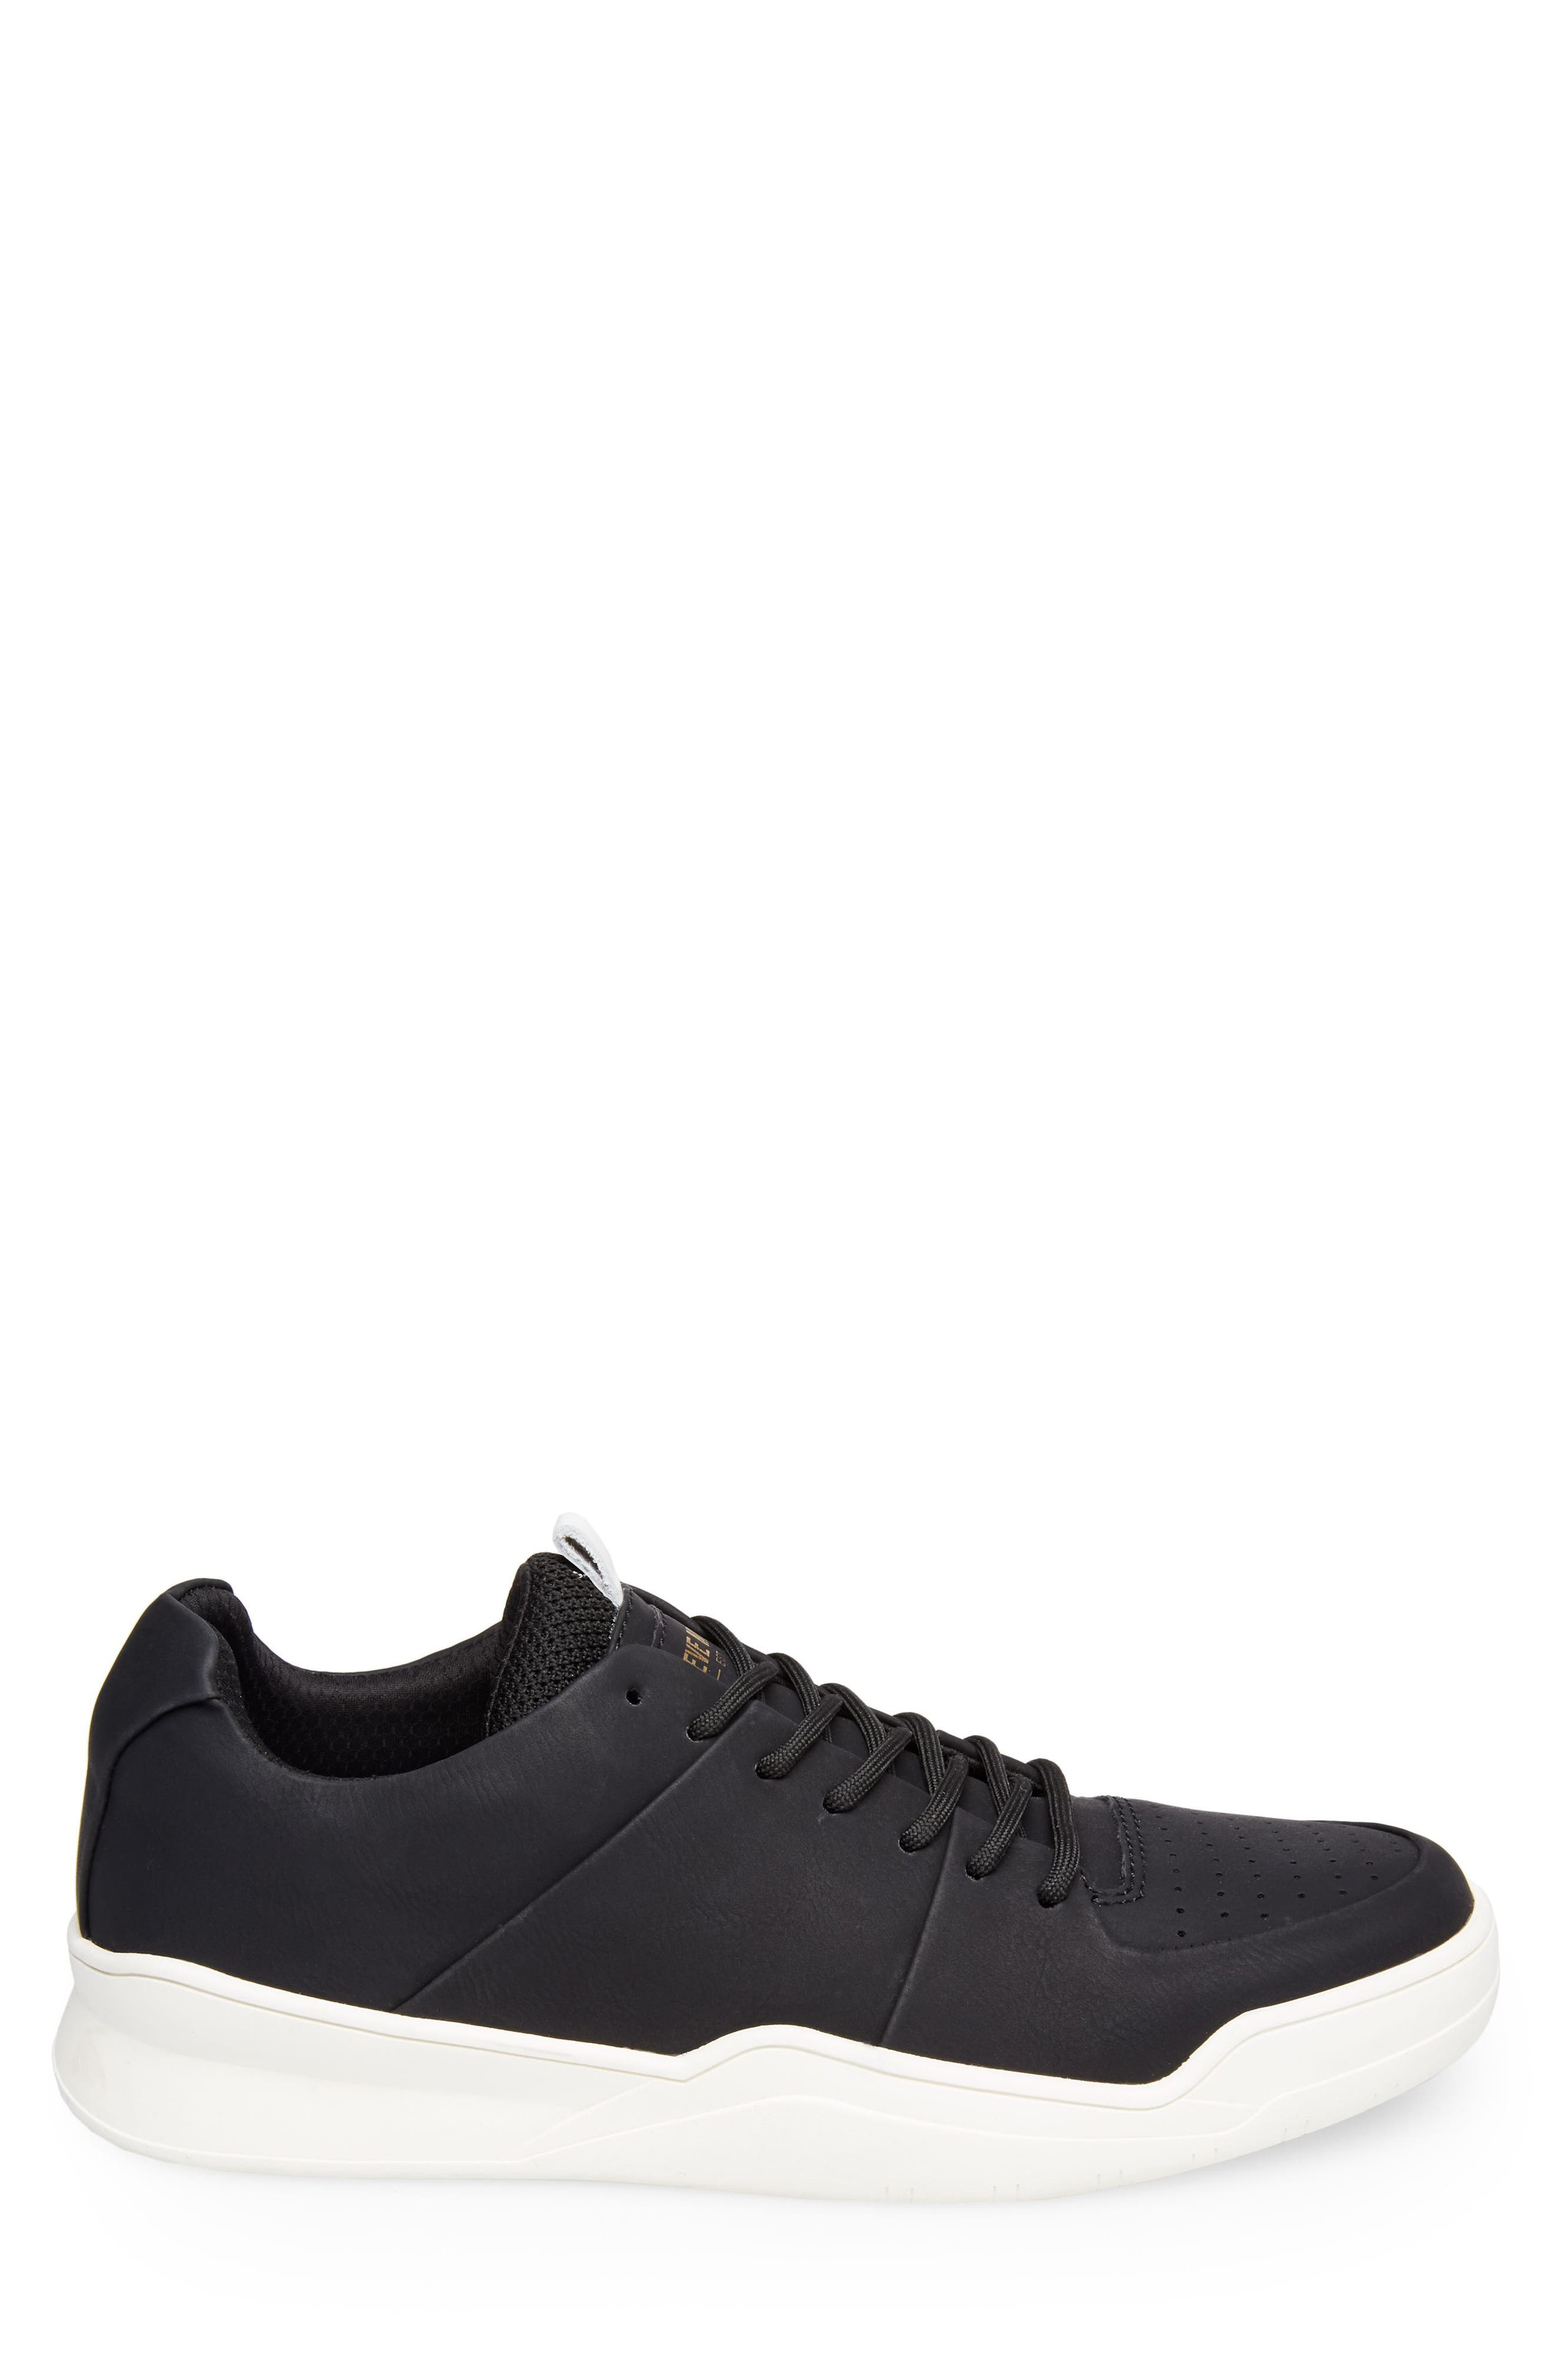 Vantage Sneaker,                             Alternate thumbnail 3, color,                             001